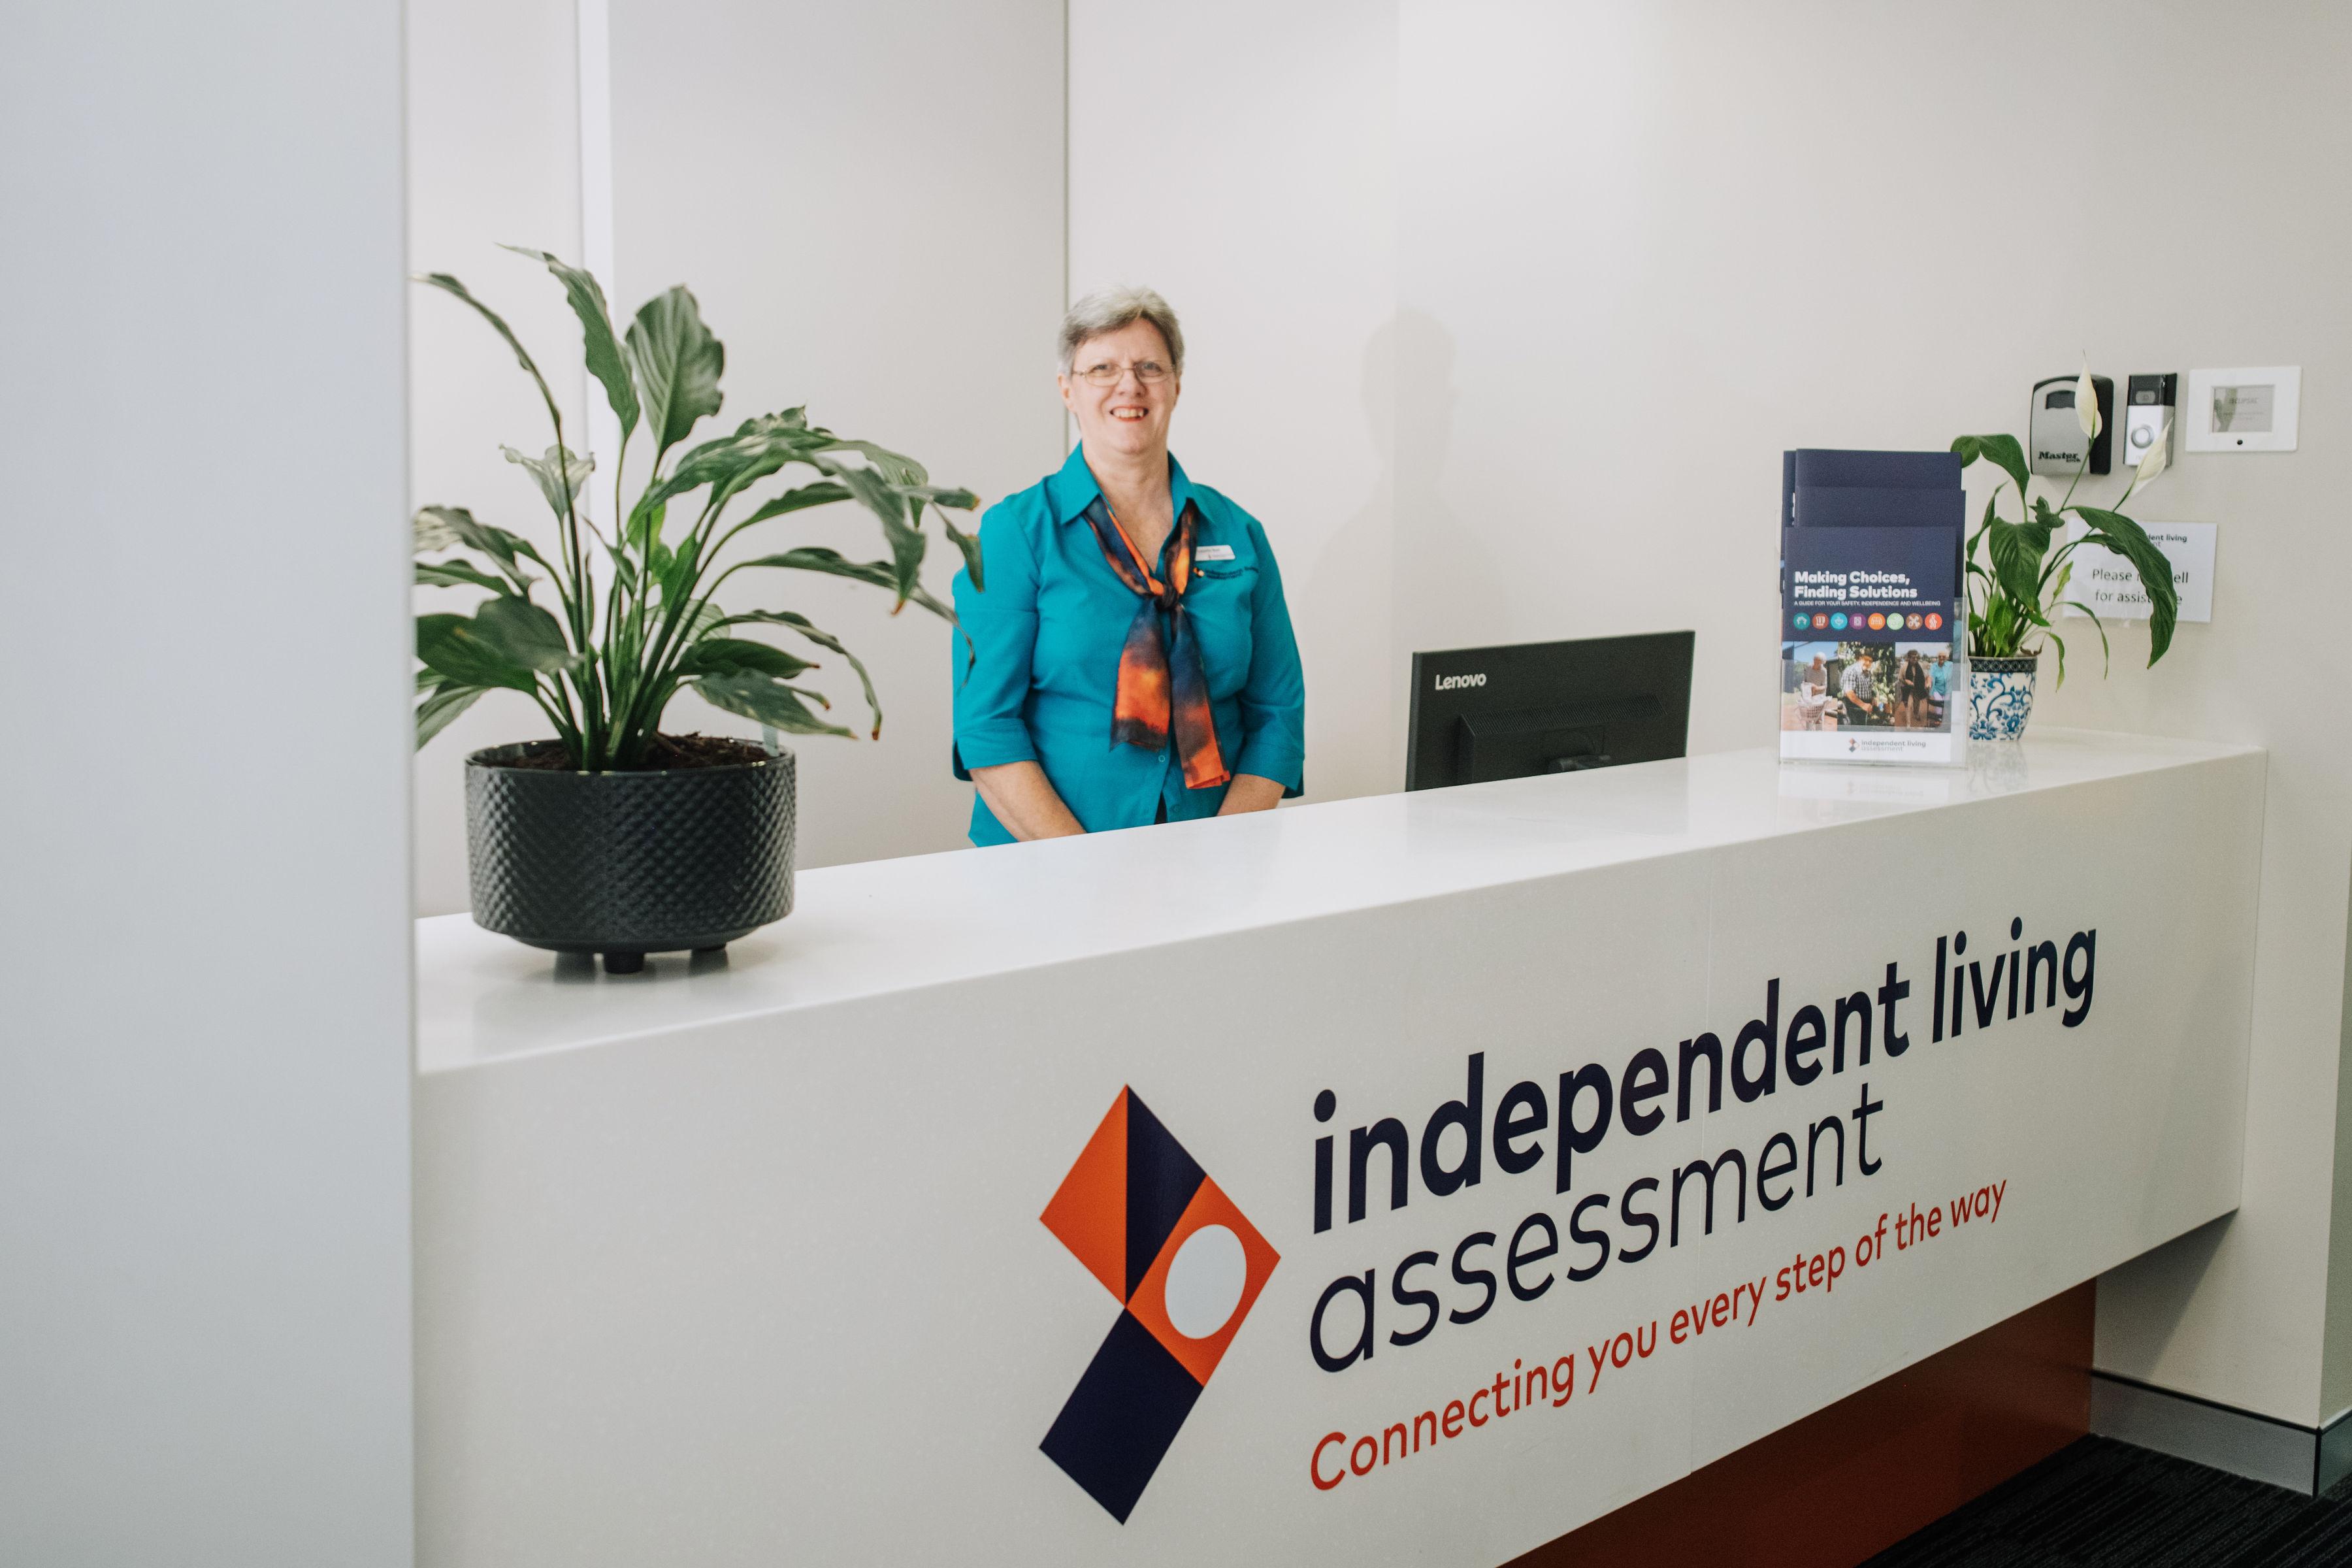 Female ILA professional standing in reception area with ILA signage